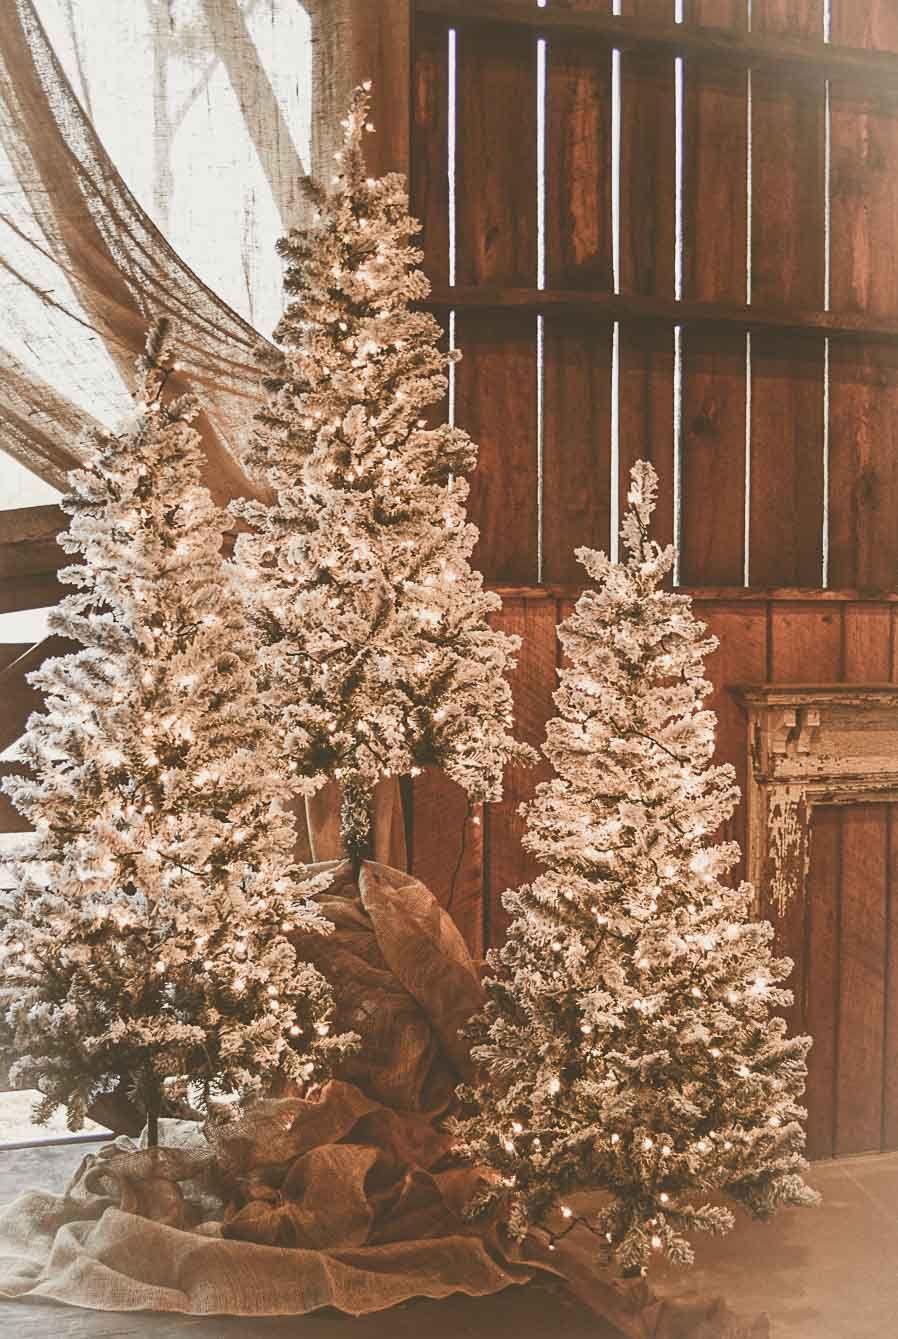 Wedding Reception Barn Wedding Decor Christmas Wedding Wedding Reception Floral Centerpie Wedding Themes Winter Winter Barn Weddings Barn Wedding Reception